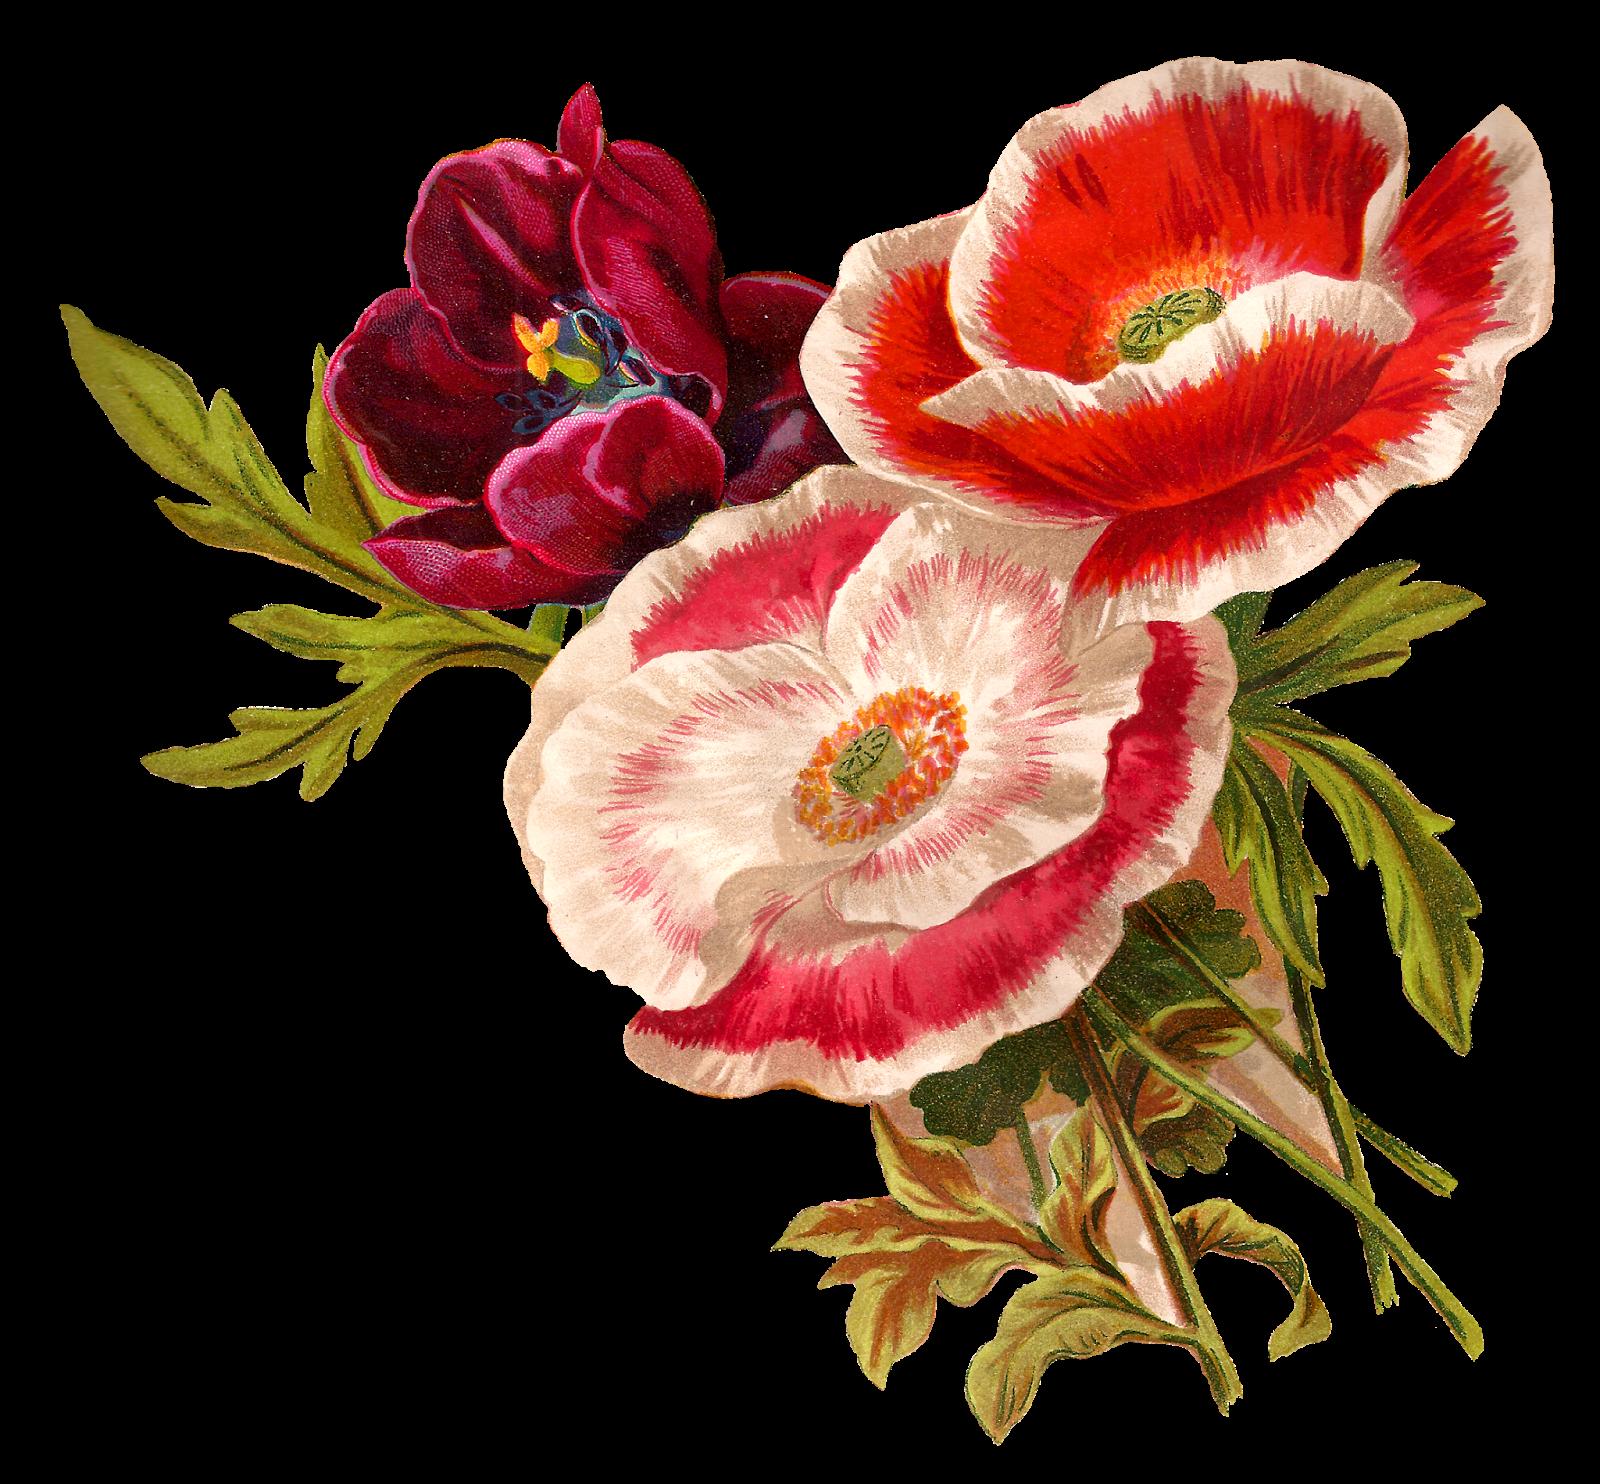 Poppy flower clipart vector freeuse Antique Images: Vintage Poppy Flower Clip Art Botanical Artwork ... vector freeuse